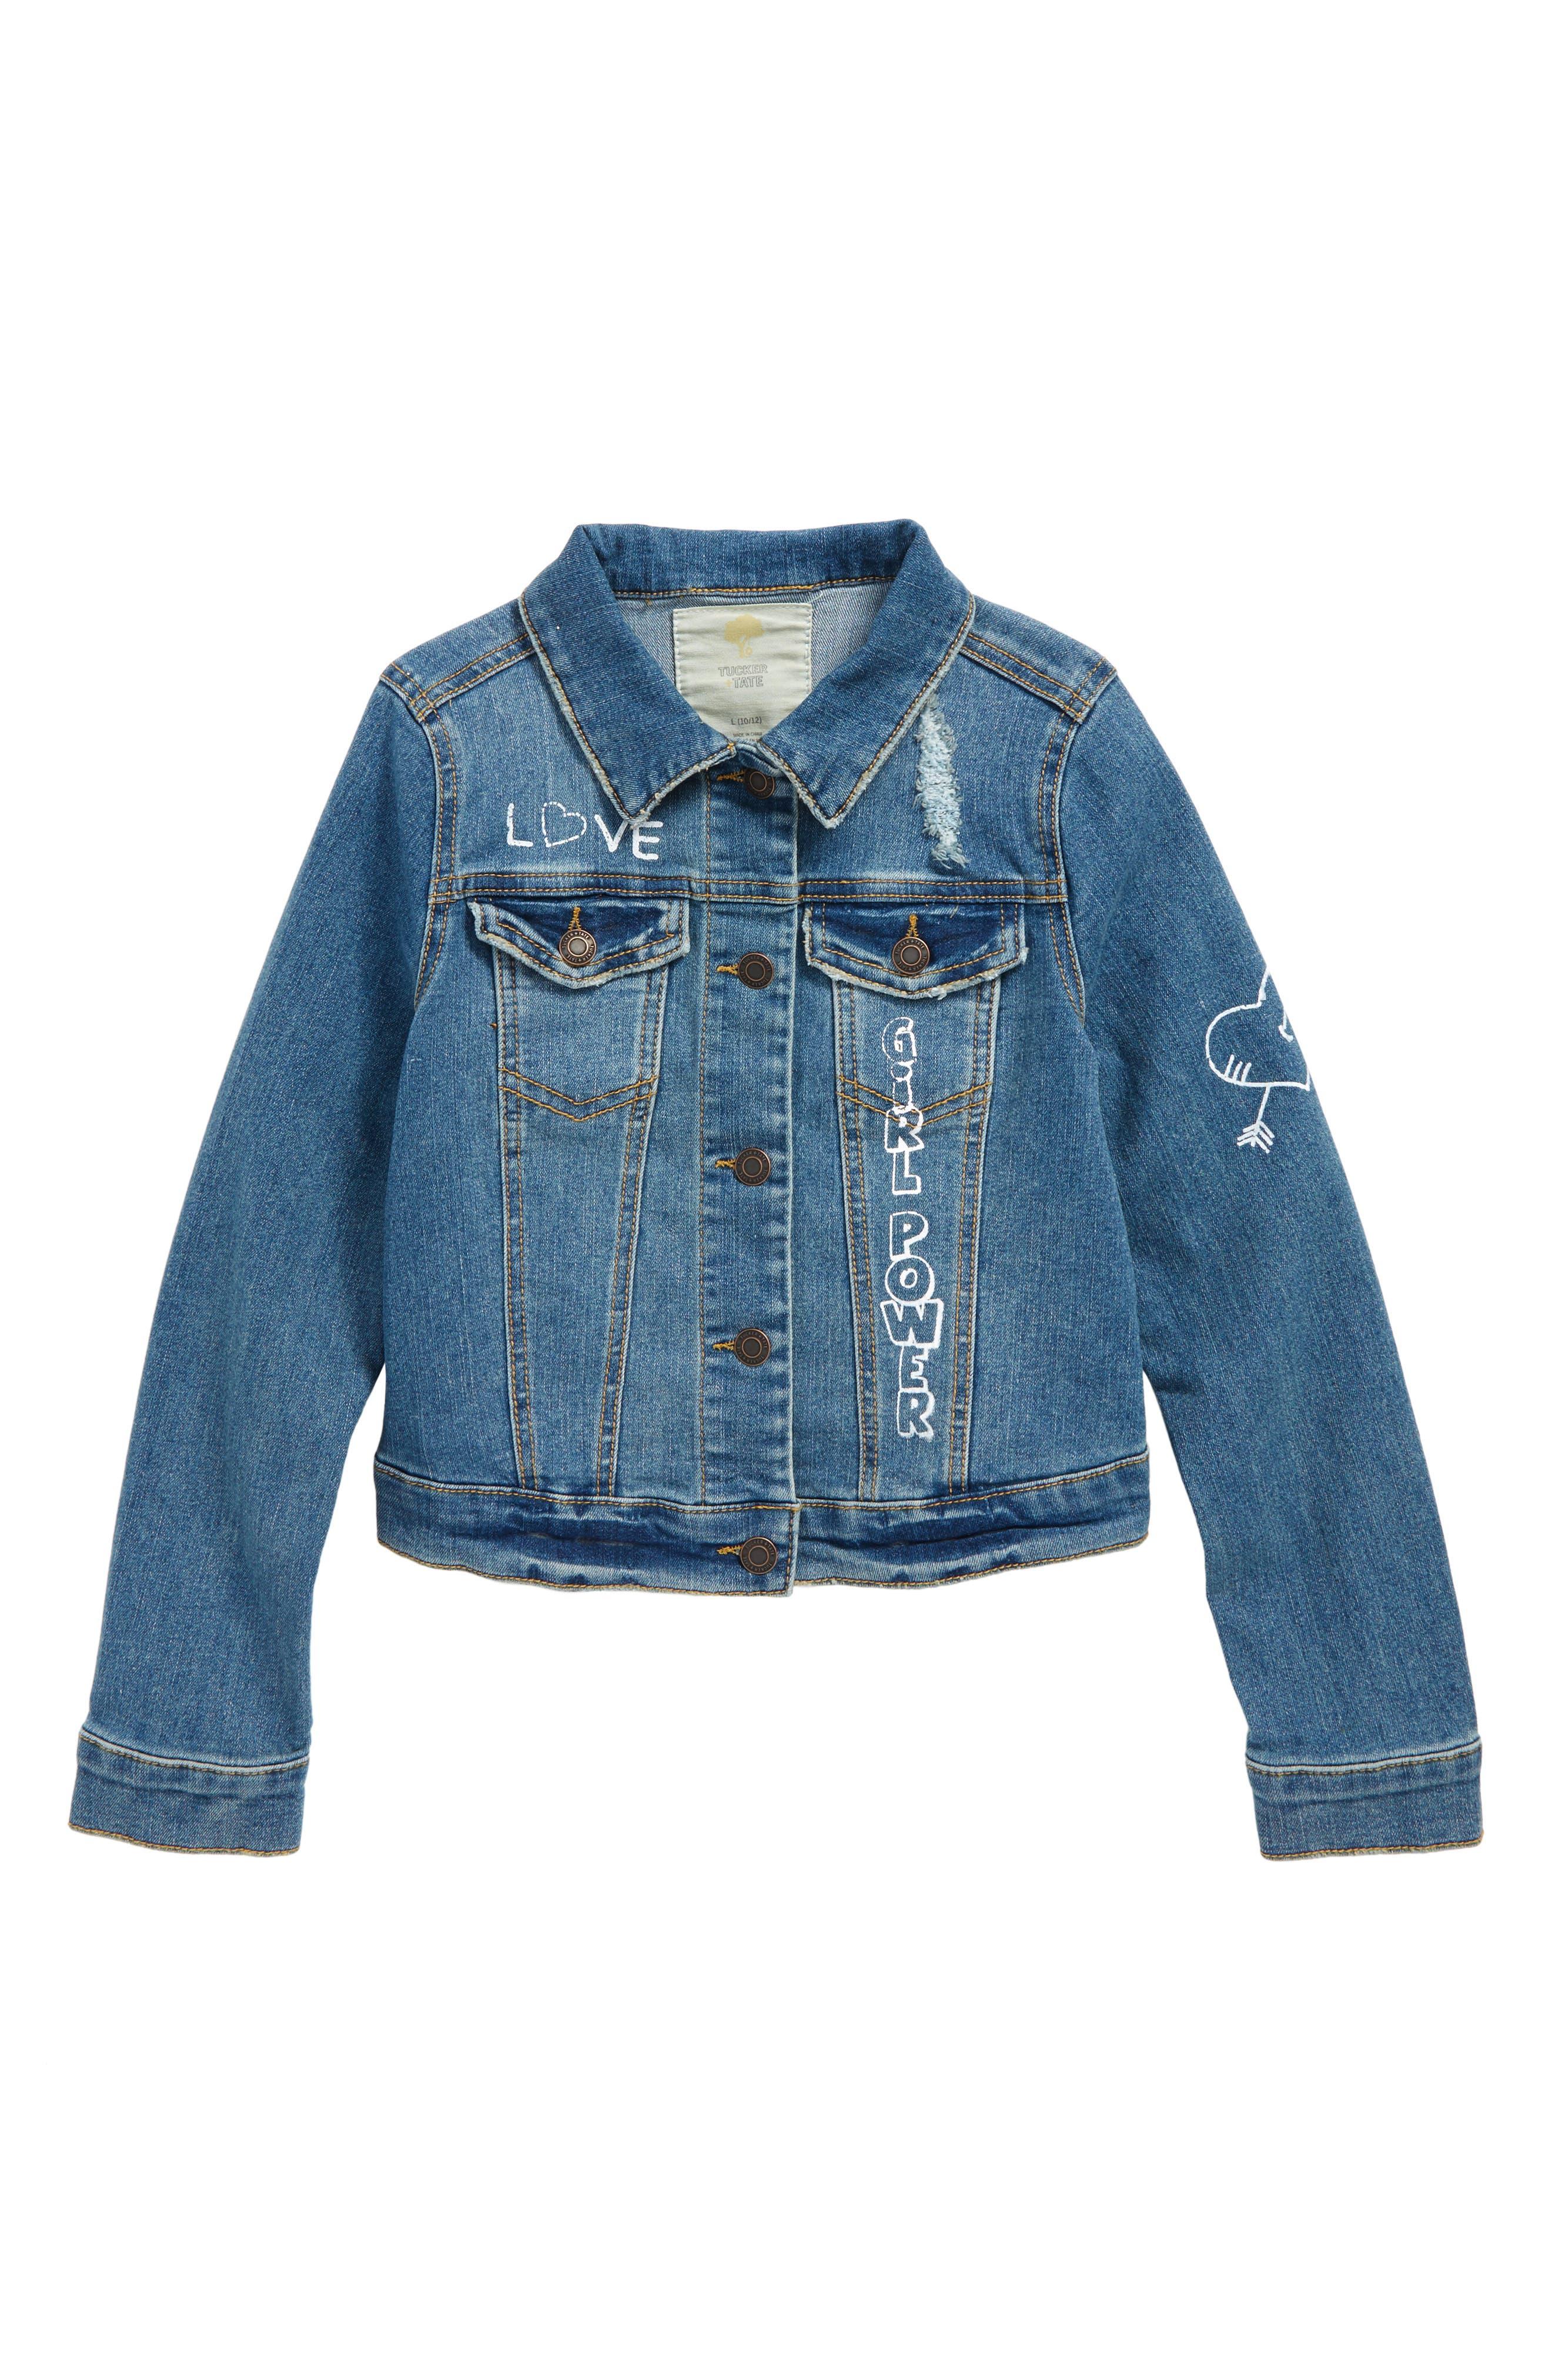 Alternate Image 1 Selected - Tucker + Tate Conversational Denim Jacket (Big Girls)